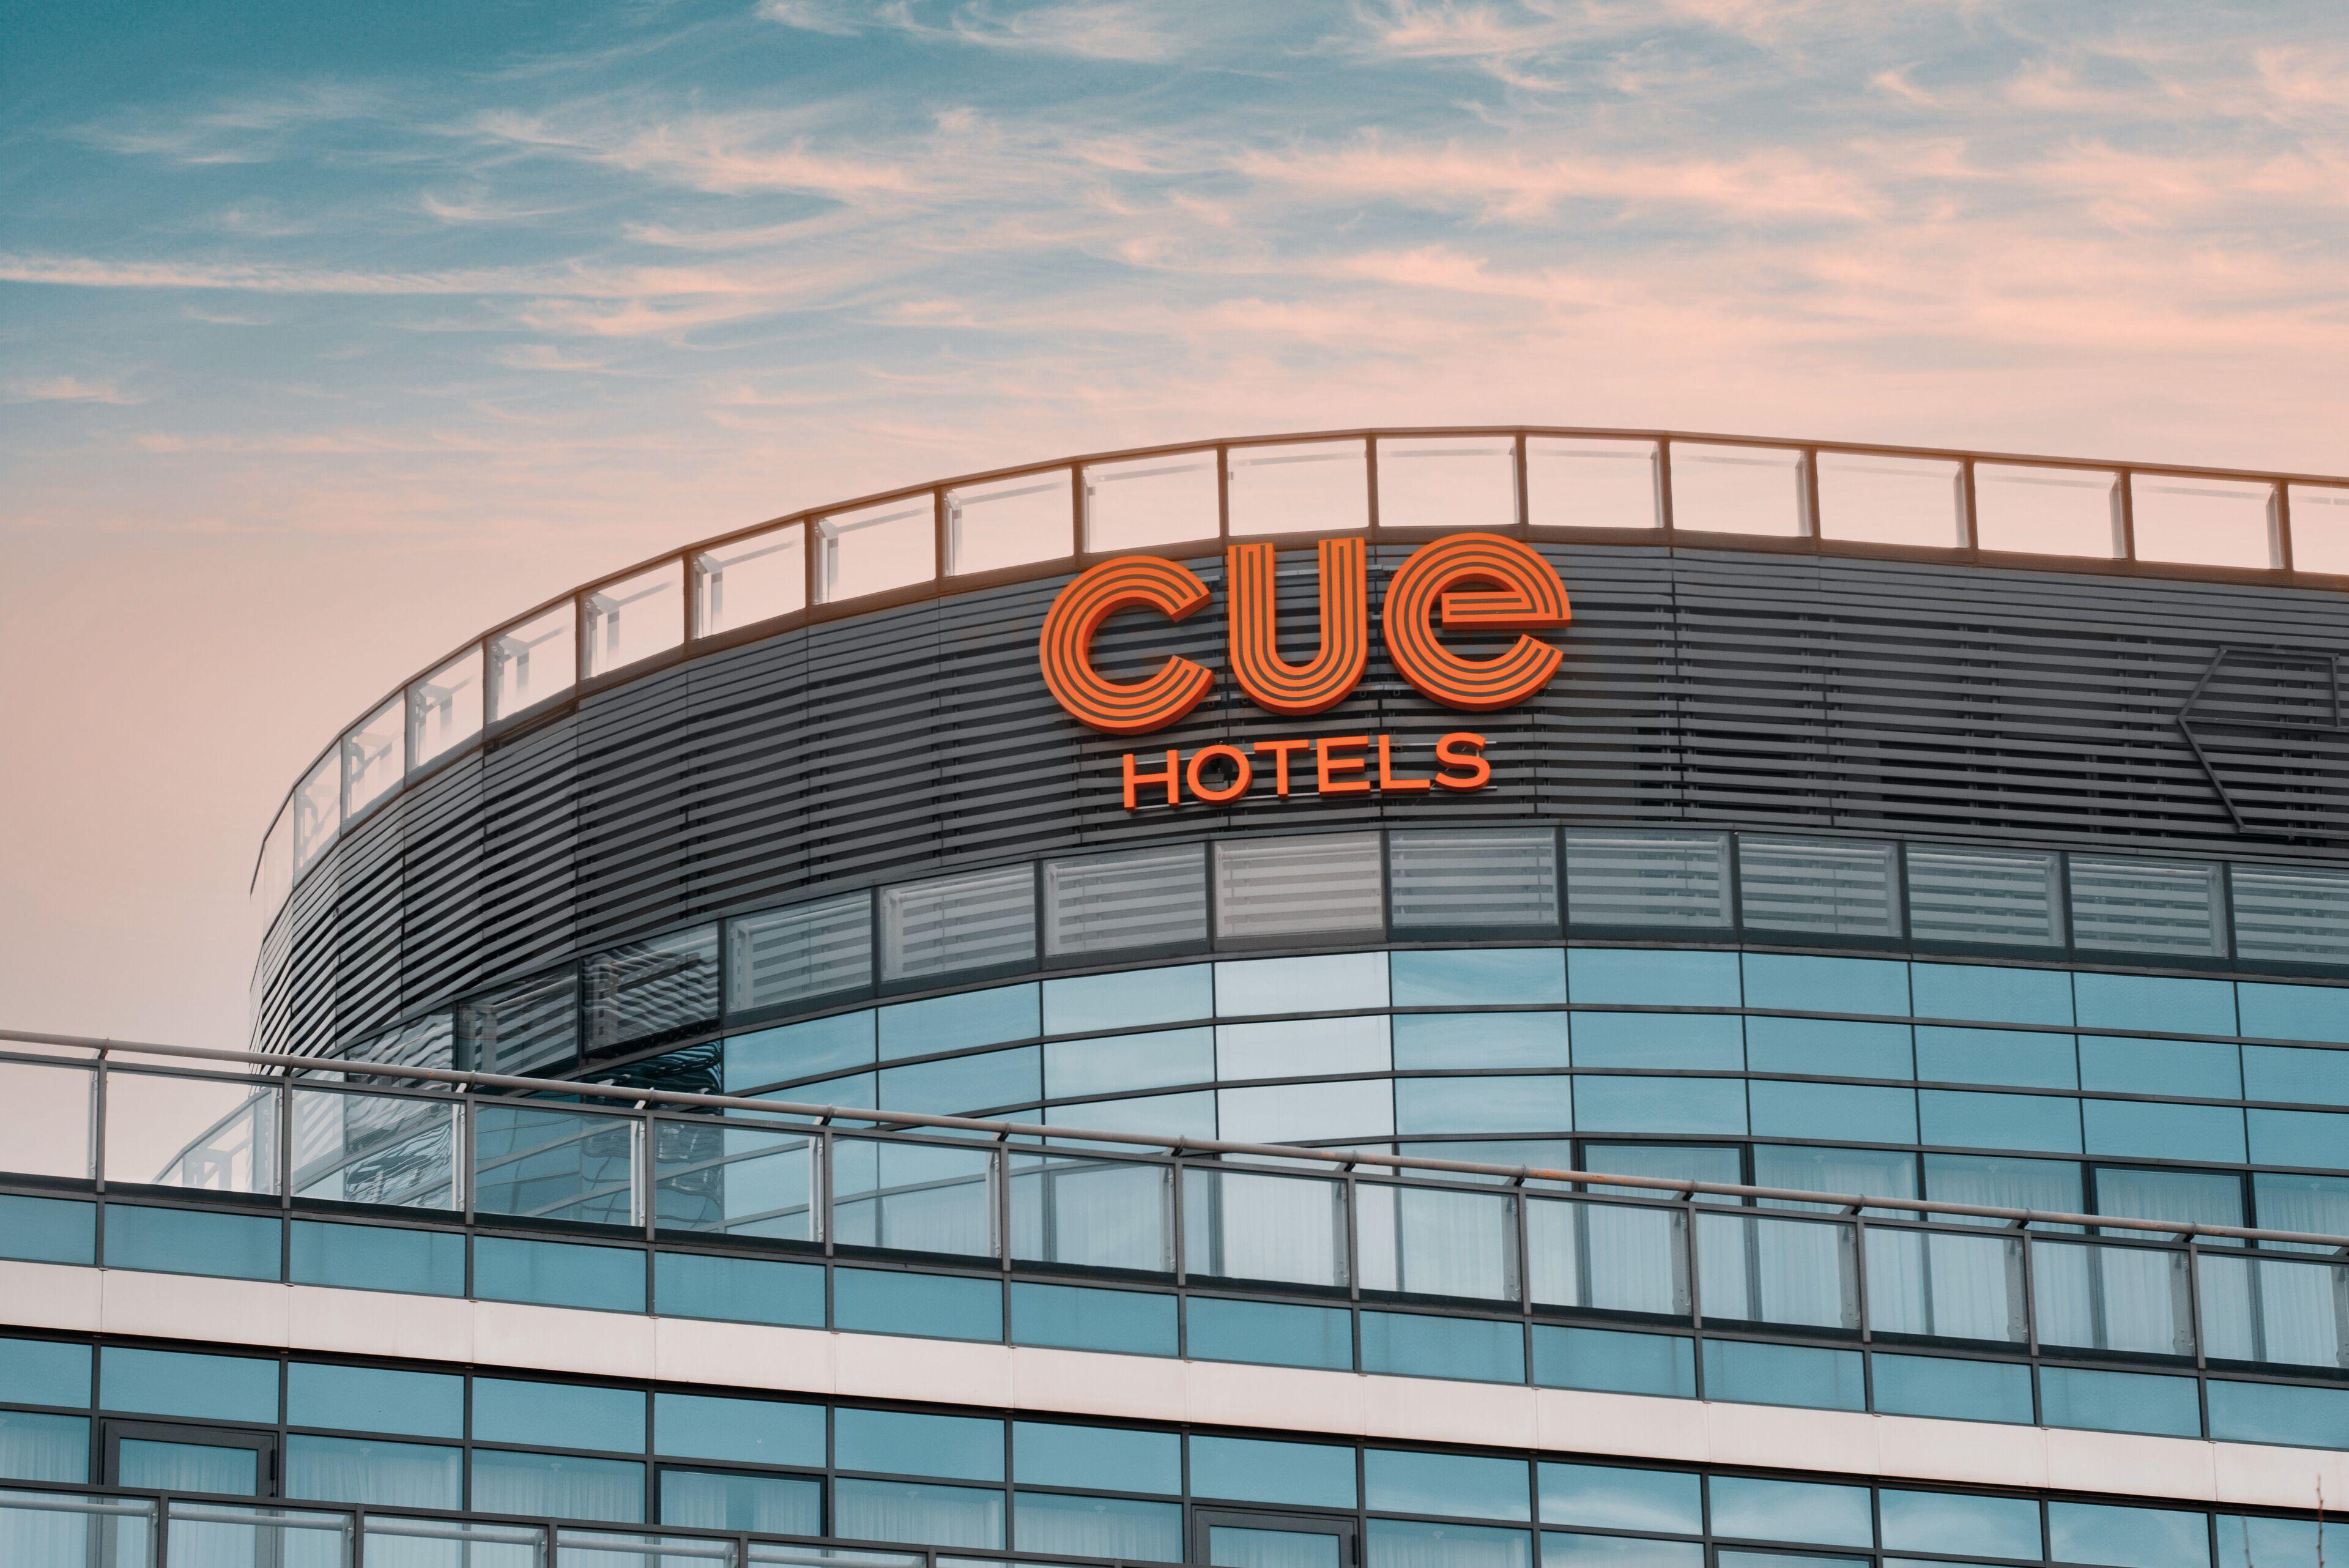 Centreville Hotel&experiences Montenegro